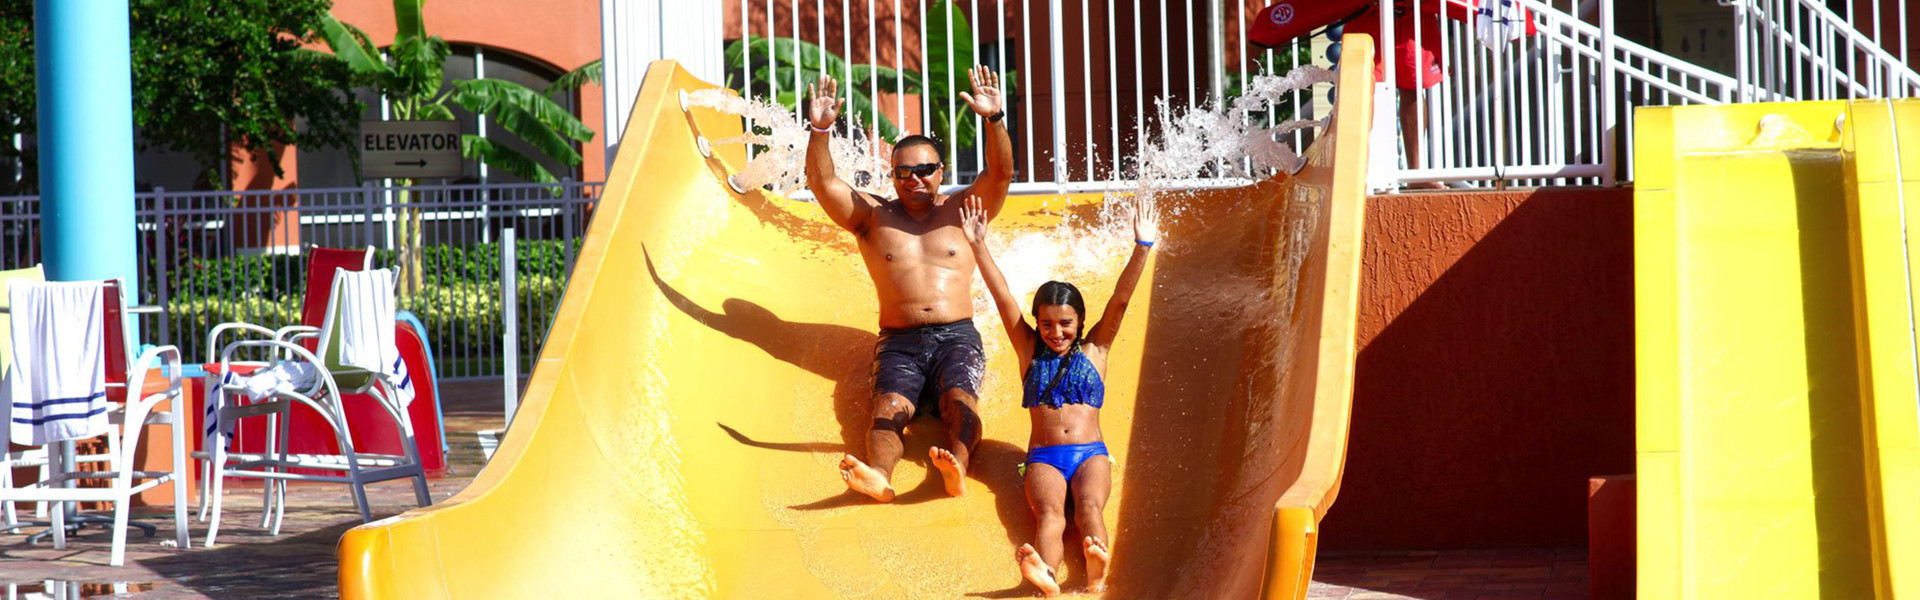 Ship Wreck Island Water Park Westgate Town Center Resort